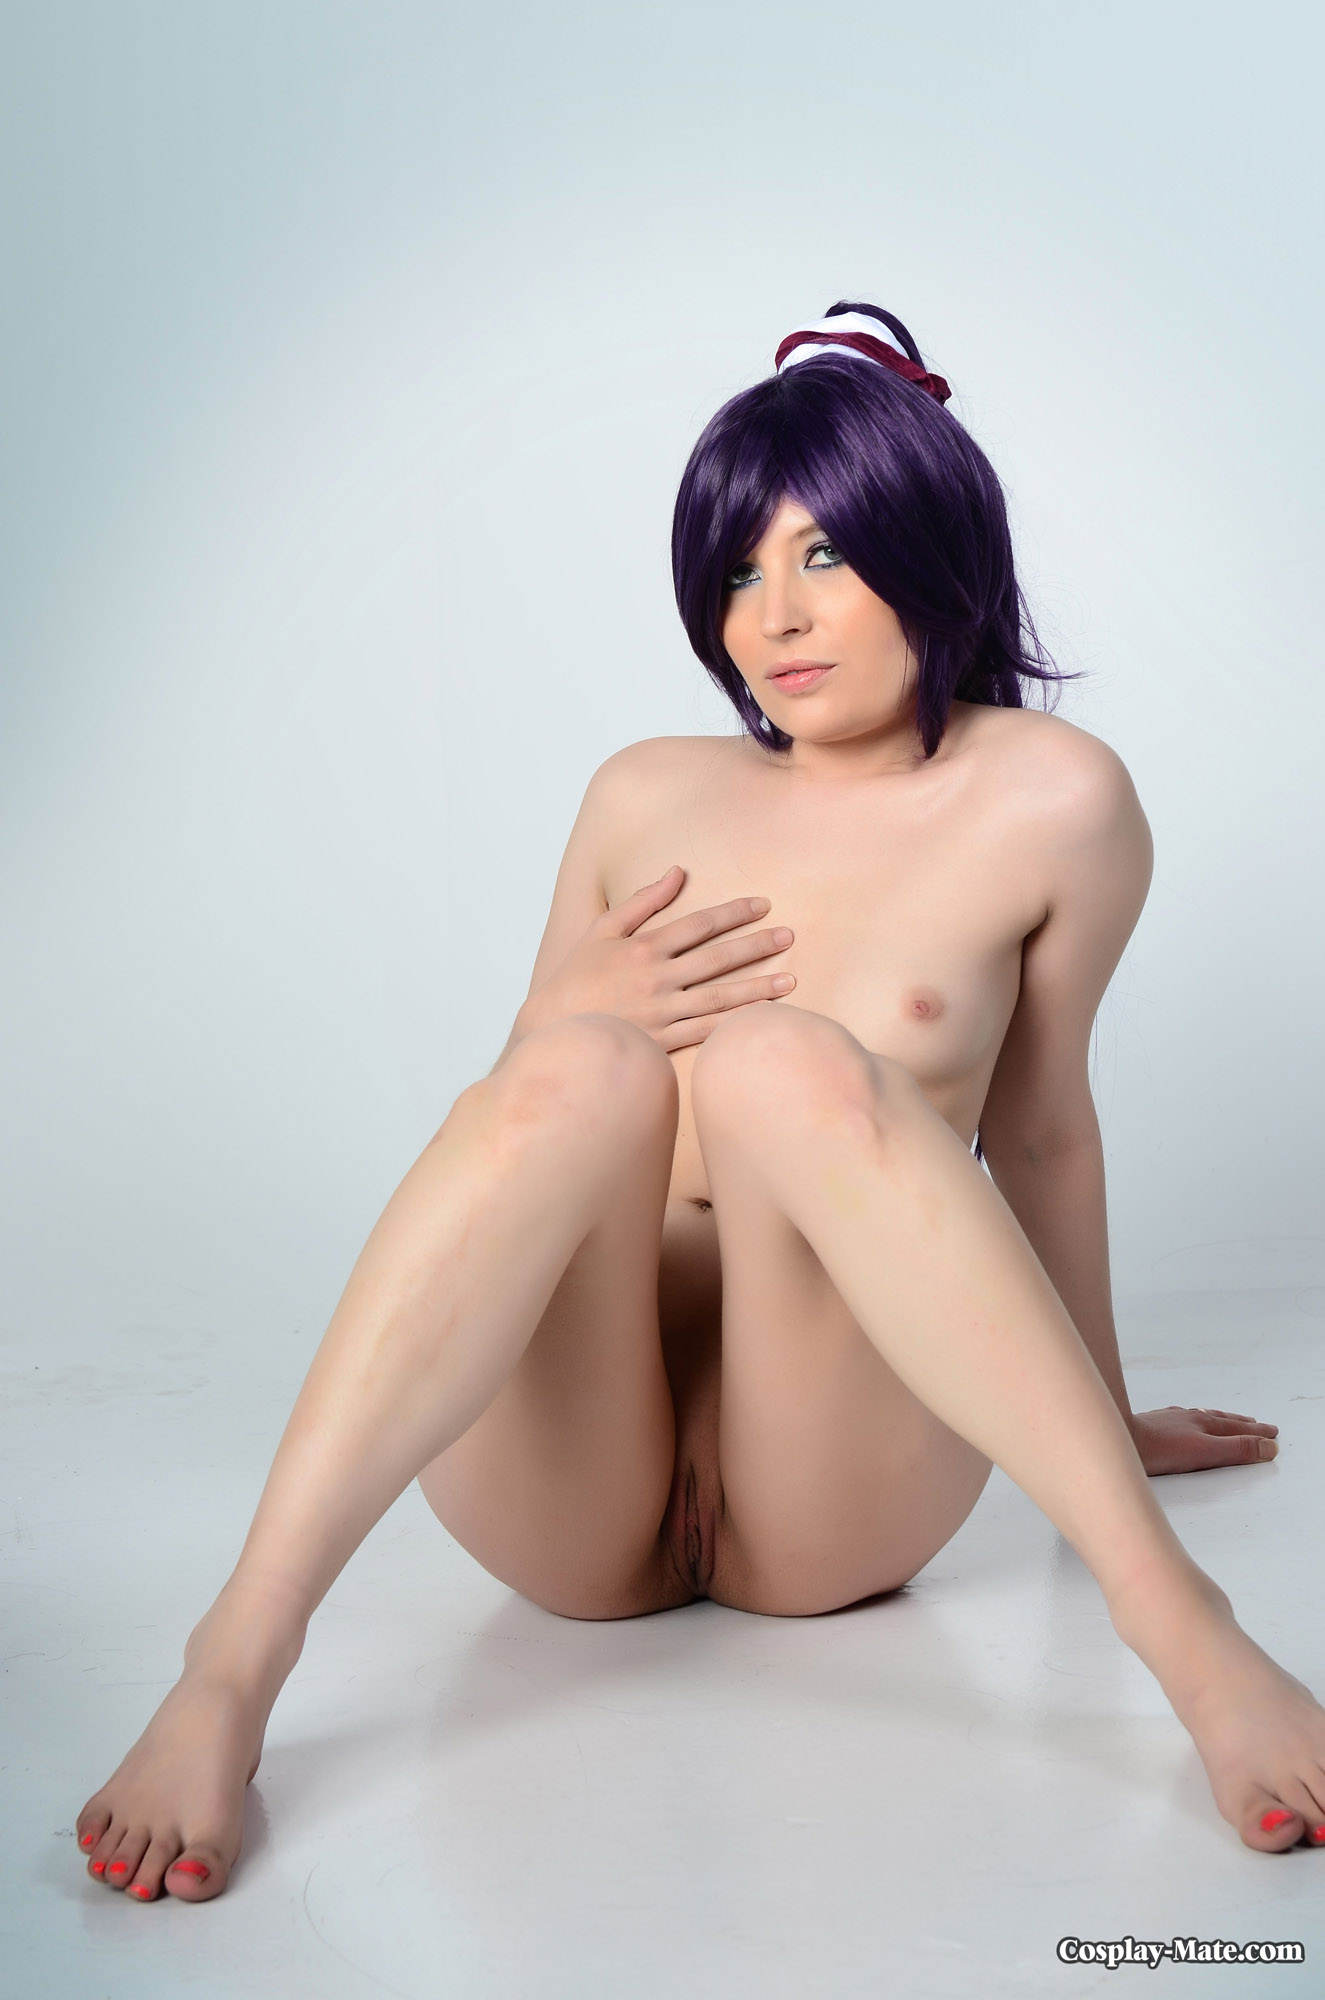 Comic con cosplay nude